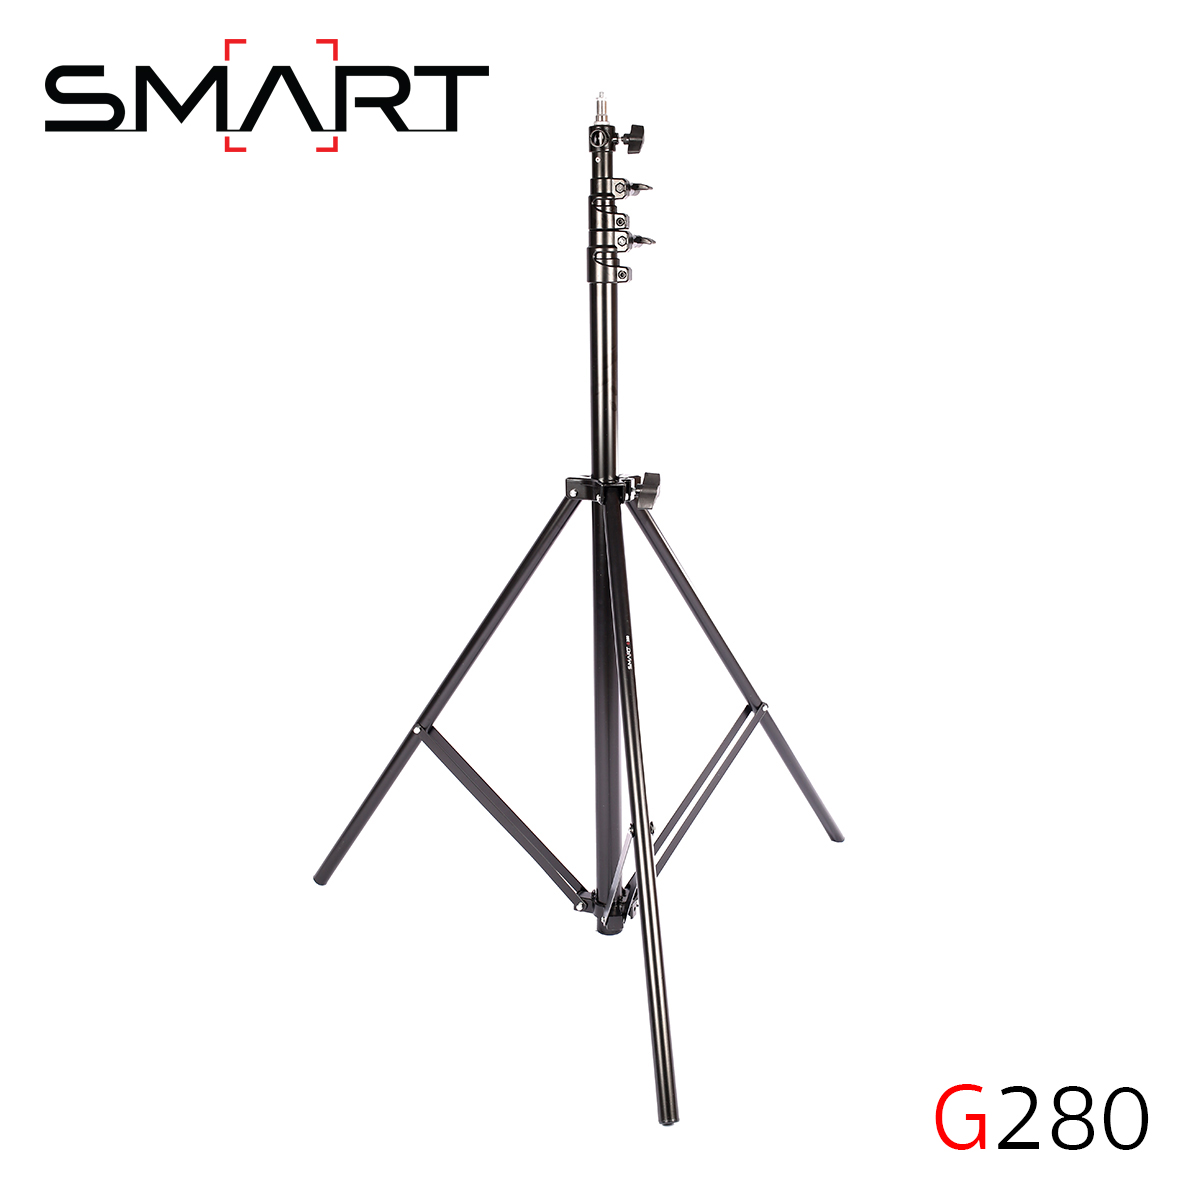 SMART Light Stand G280 ขาตั้งไฟโช็คลม (280cm)